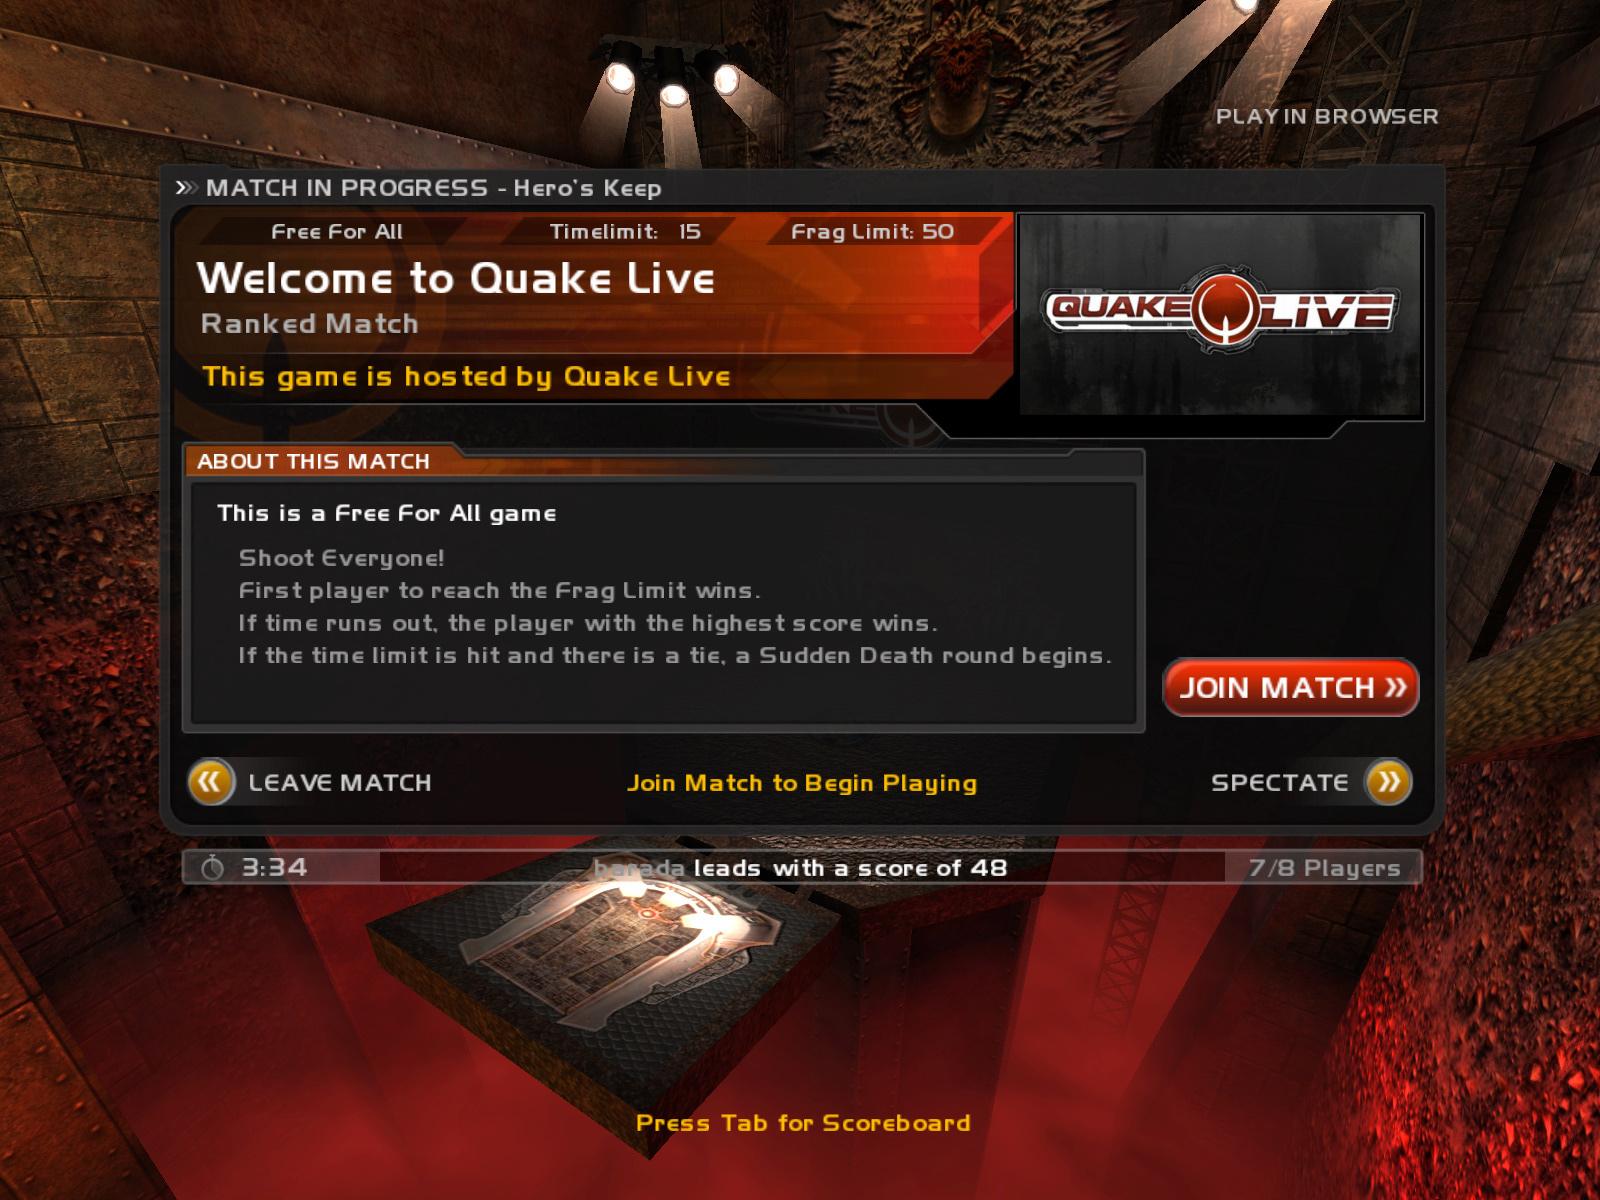 worldfungamesru_QuakeLive6